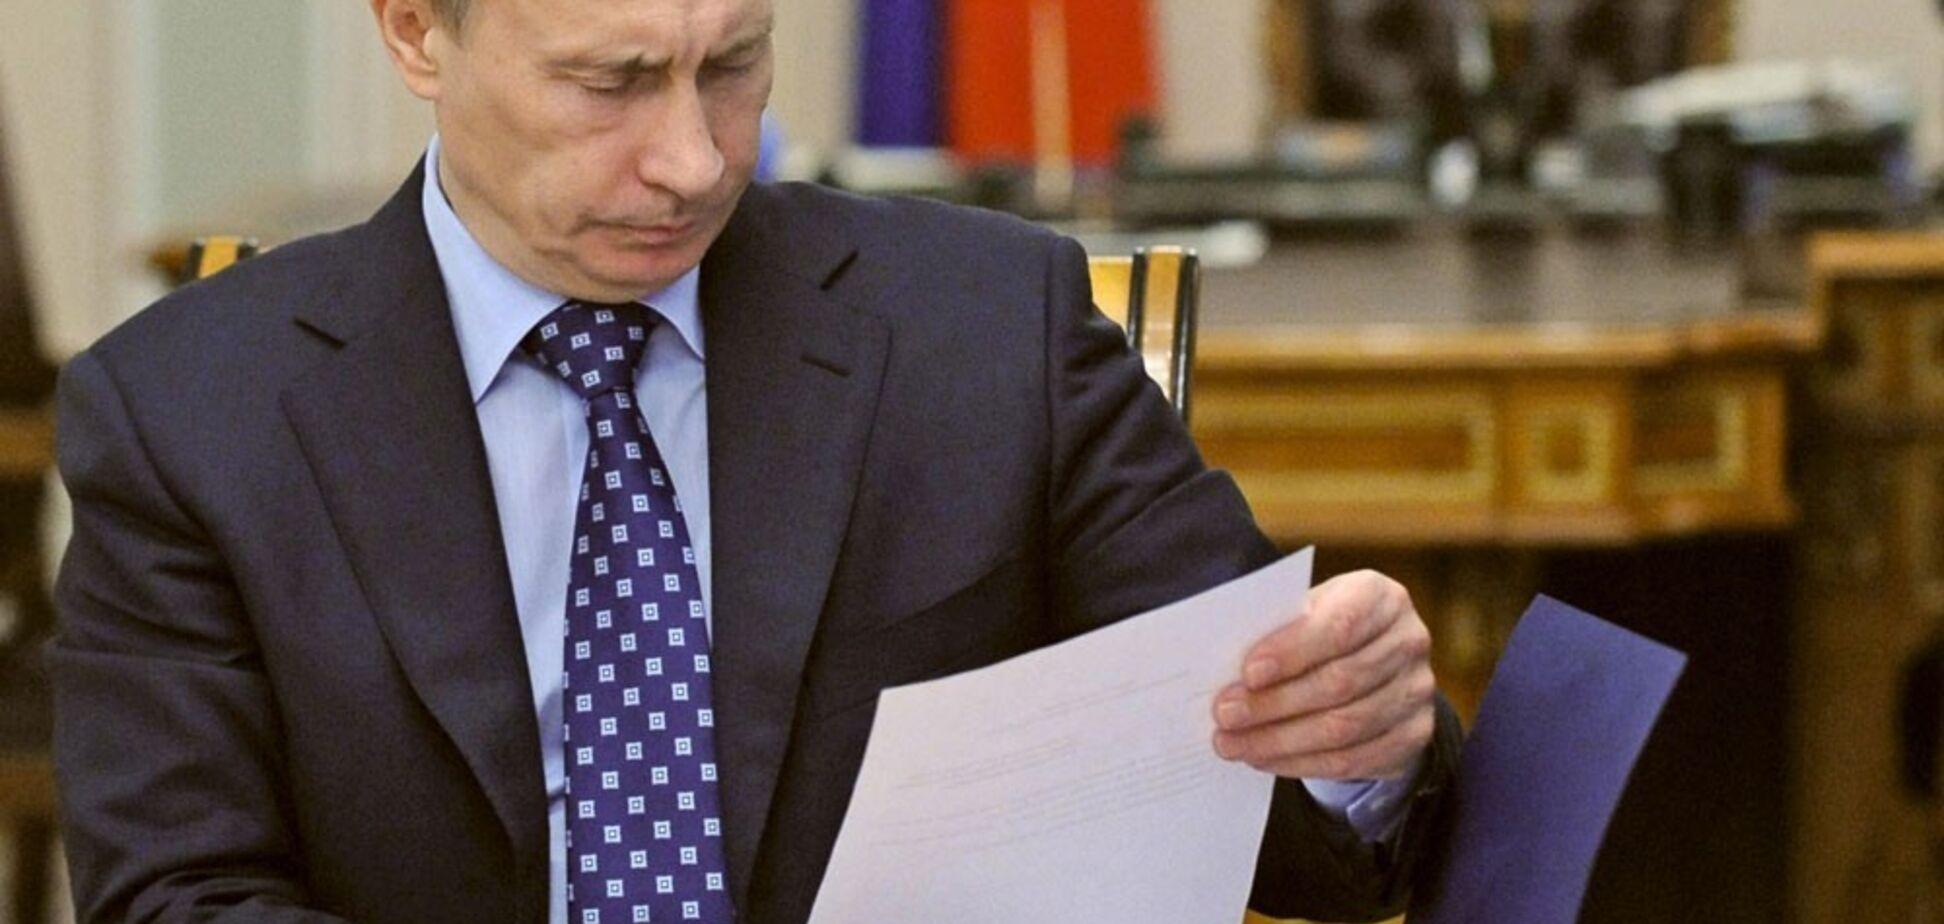 Кто свергнет Путина: озвучен неожиданный прогноз